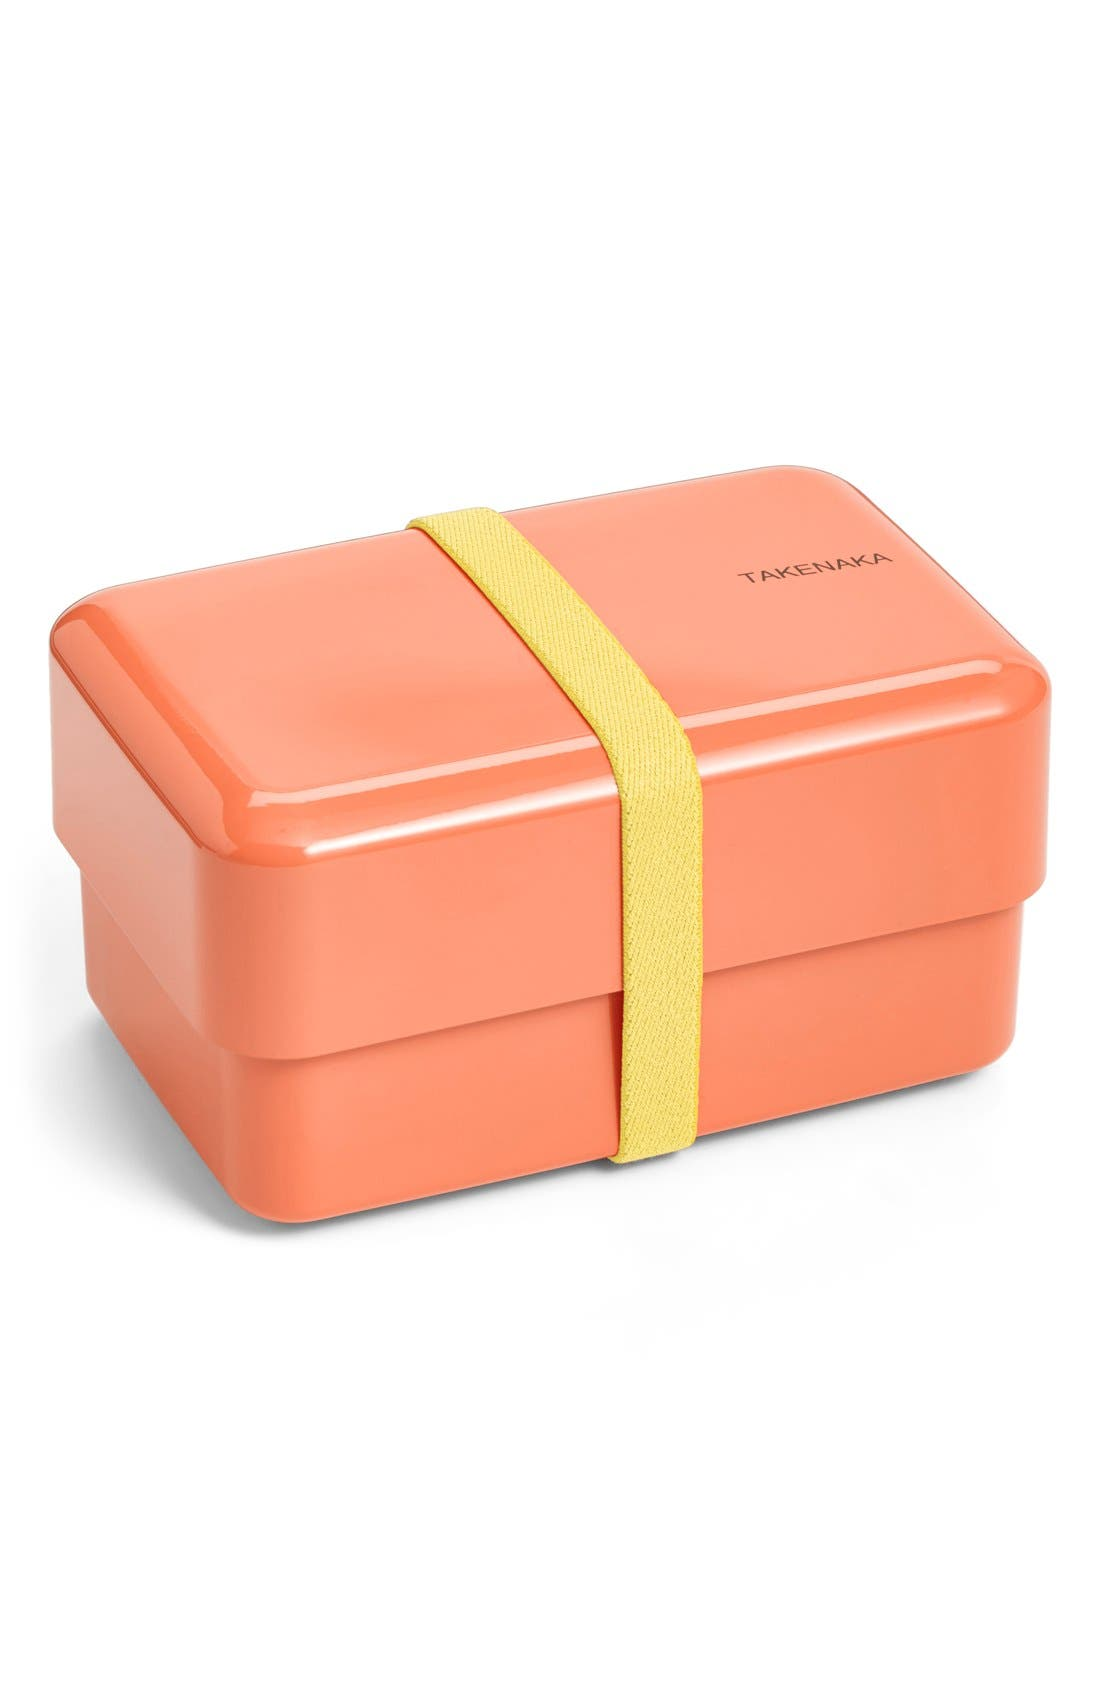 Main Image - Takenaka Bento Box 'Rectangle' Bento Box